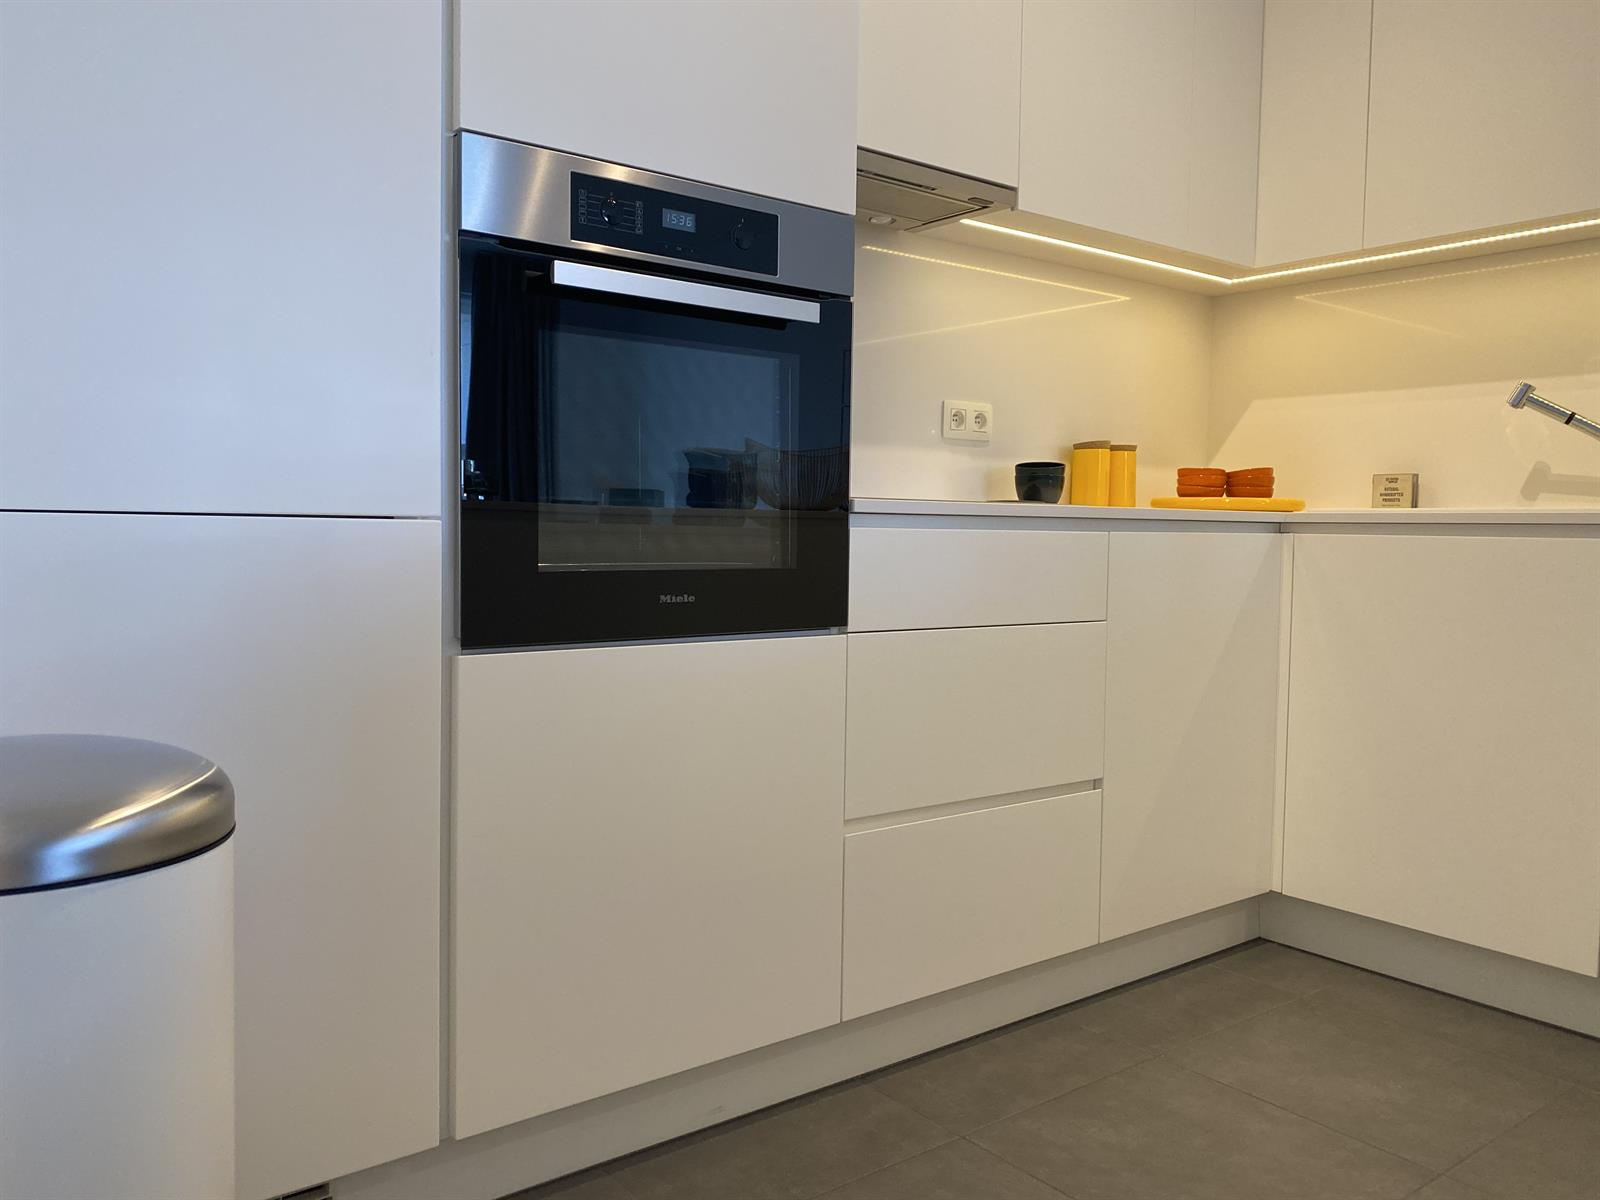 Appartement - Woluwe-Saint-Lambert - #4455478-3